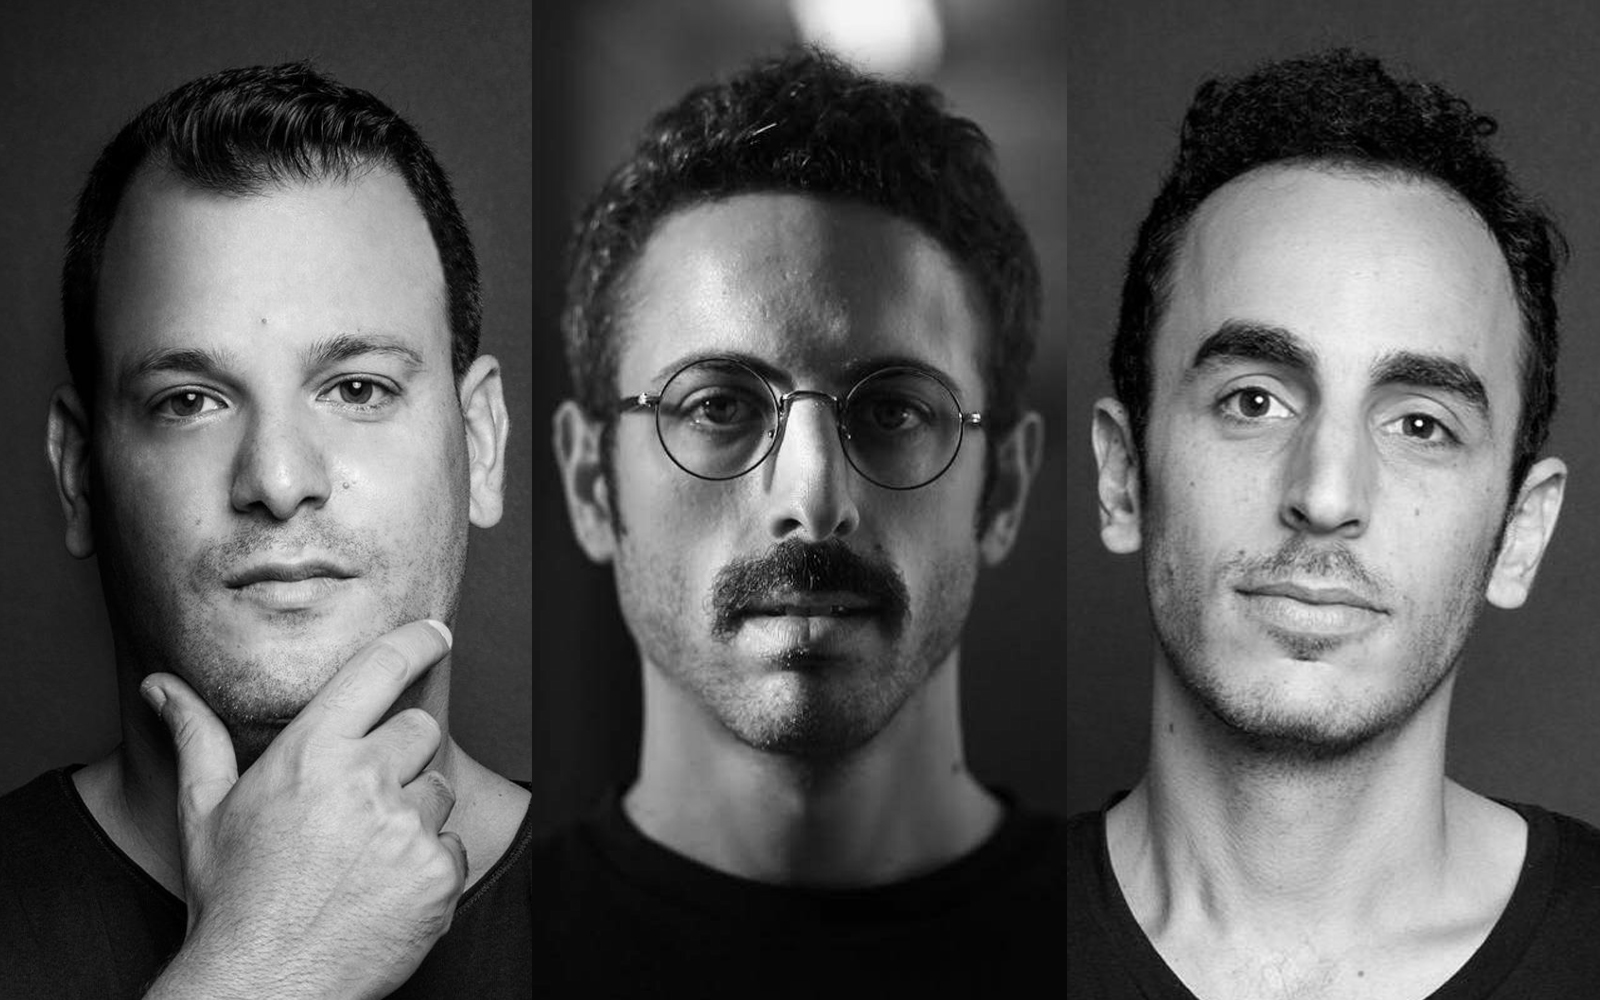 SubCulture presents The Block Tel Aviv